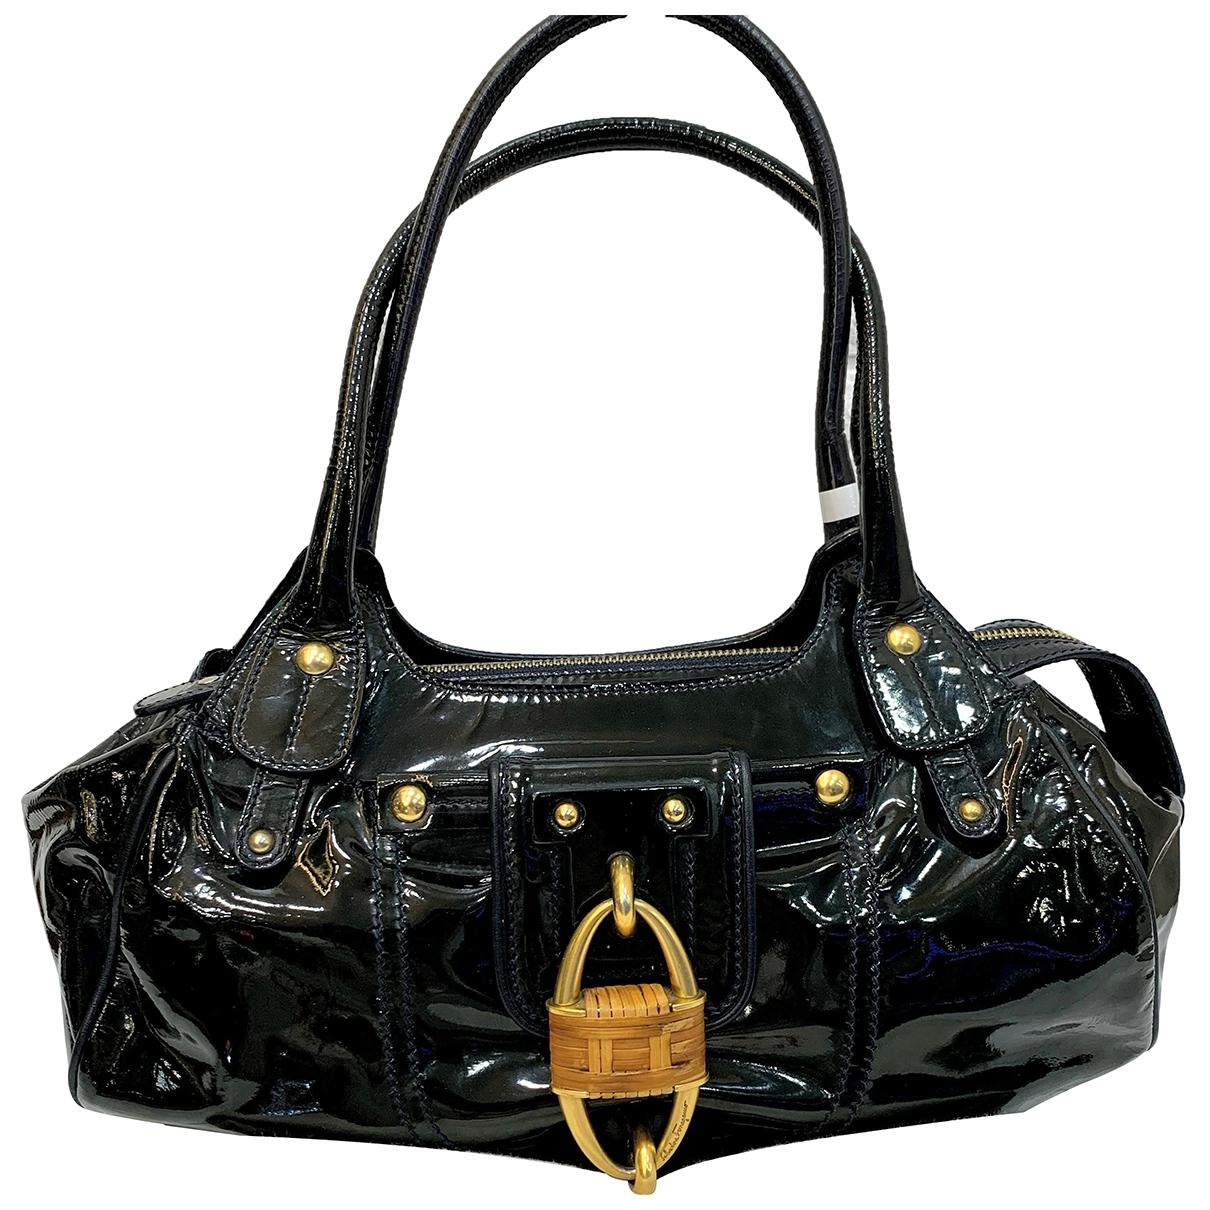 Salvatore Ferragamo \N Black Patent leather handbag for Women \N